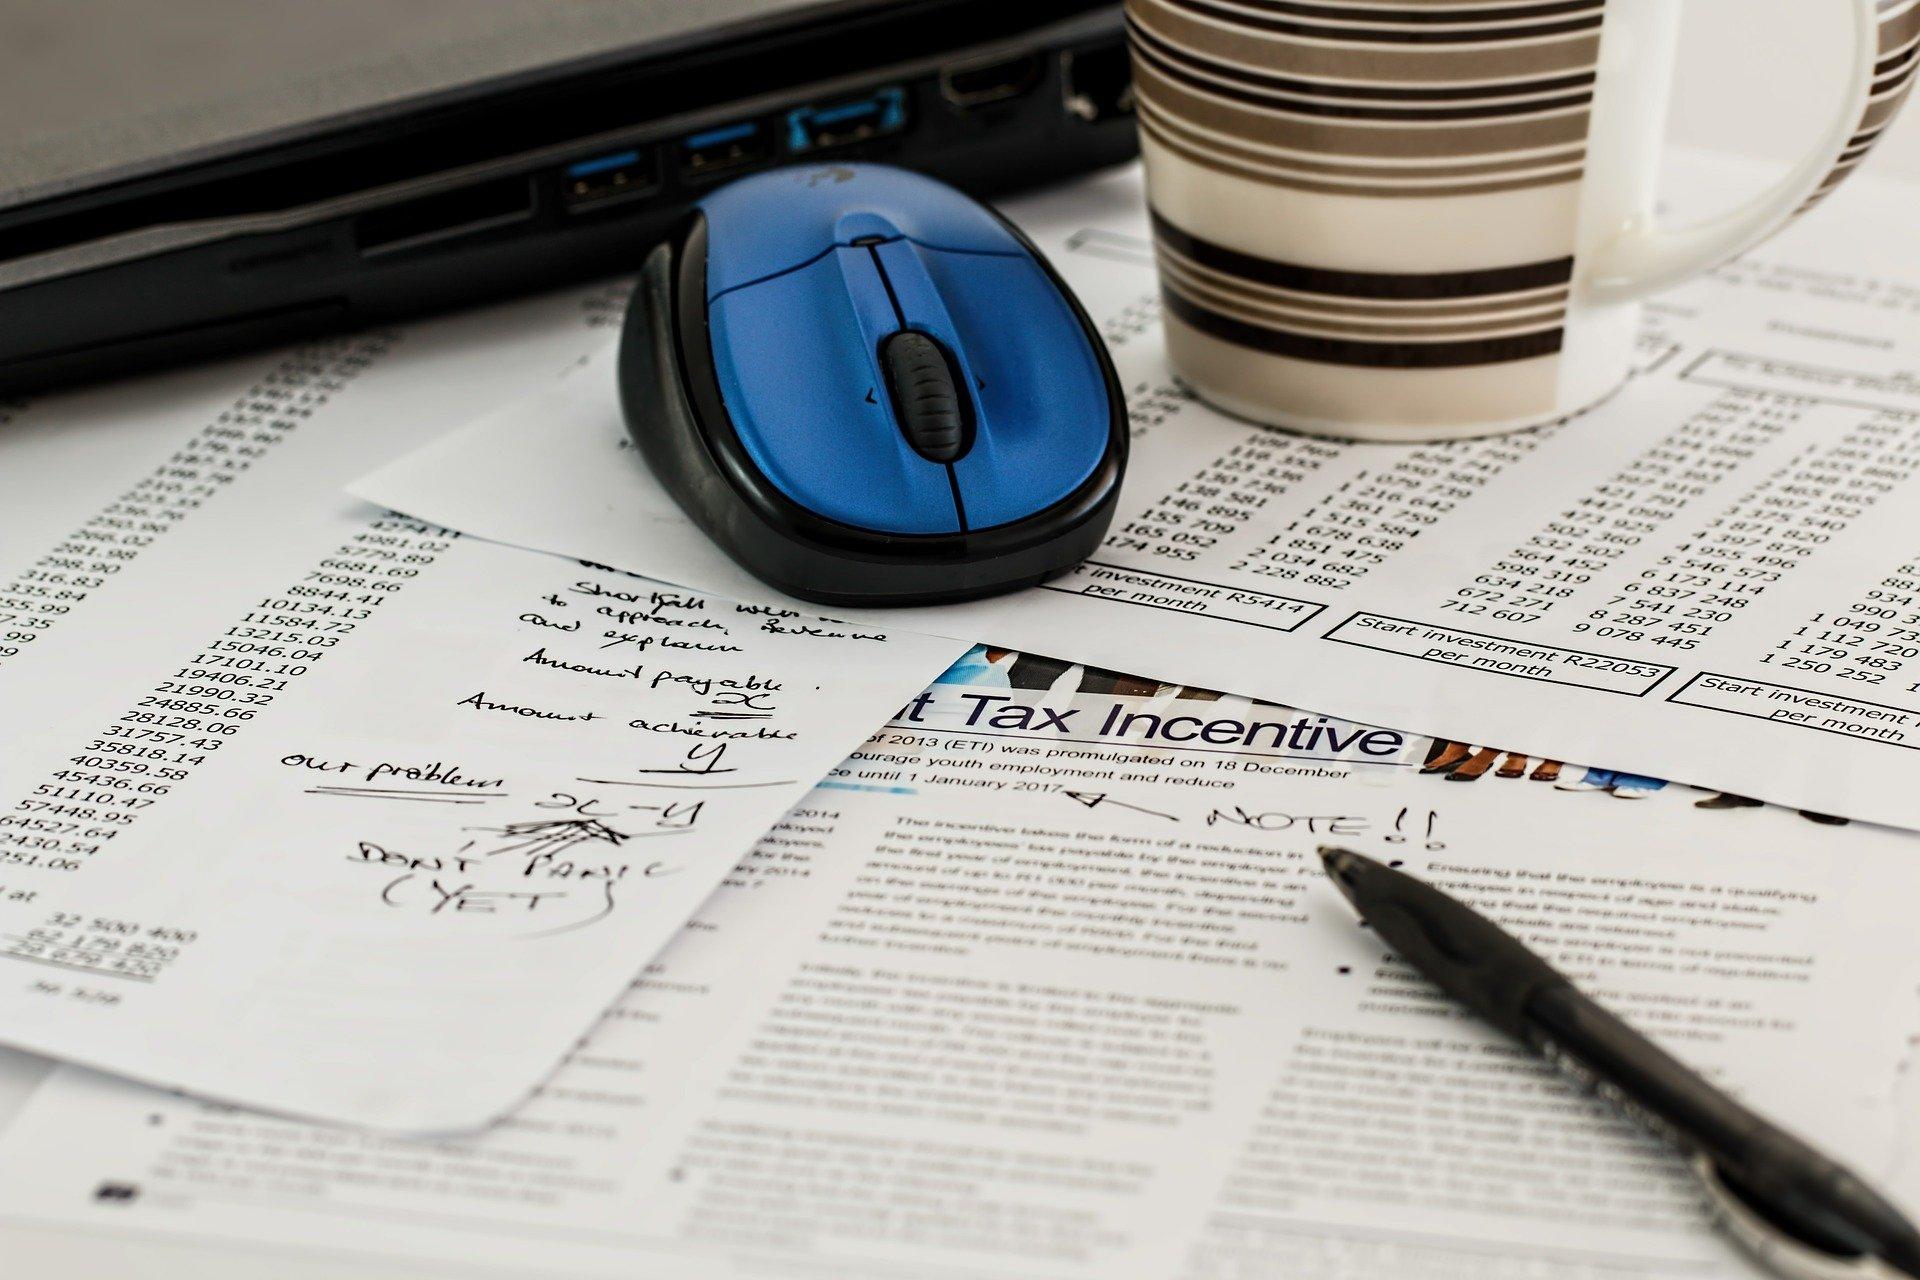 Tax forms sit on a desk under a pen.